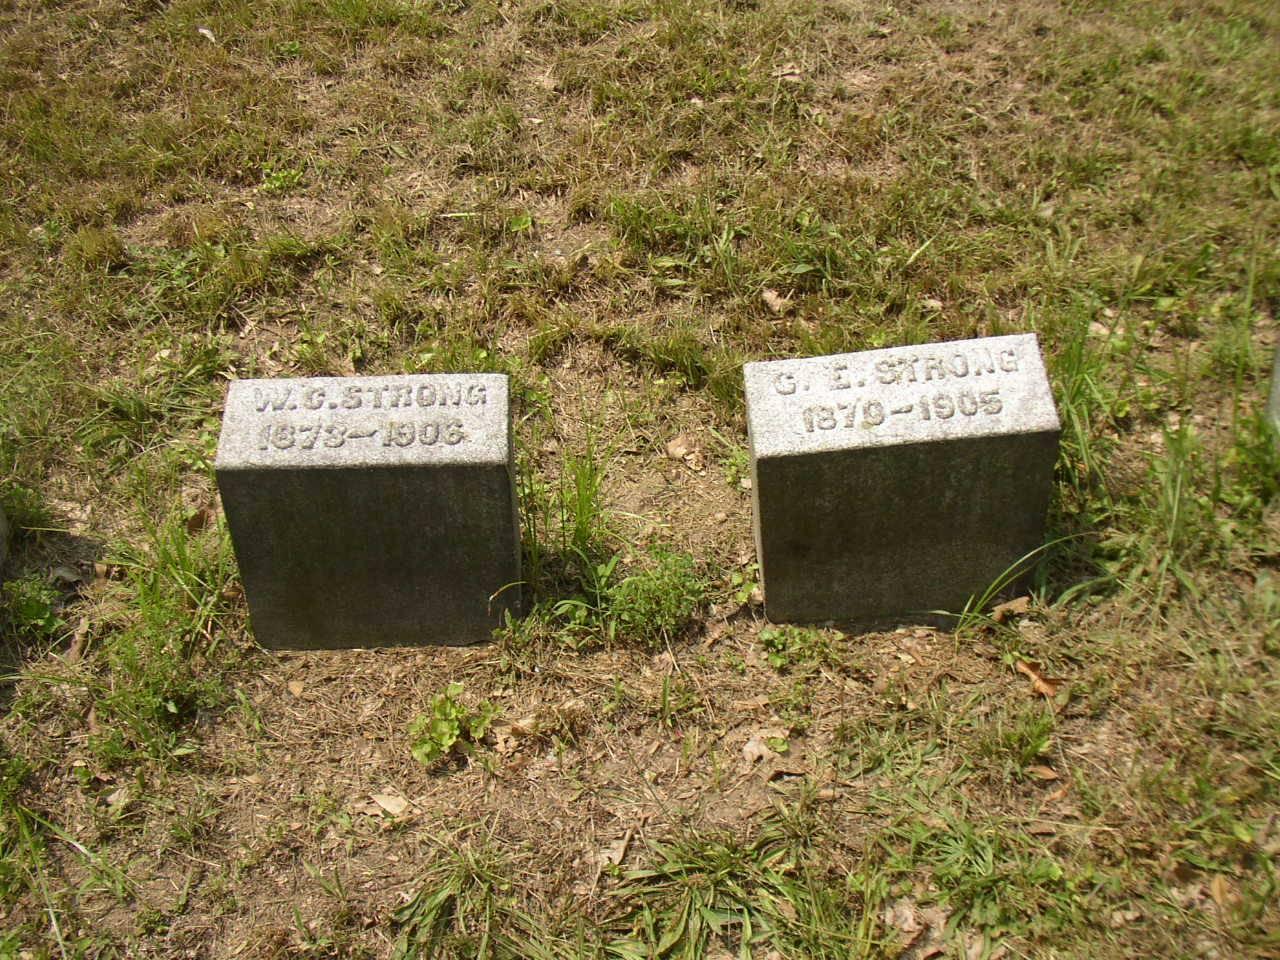 Granddad's Sons Graves 1st/2nd